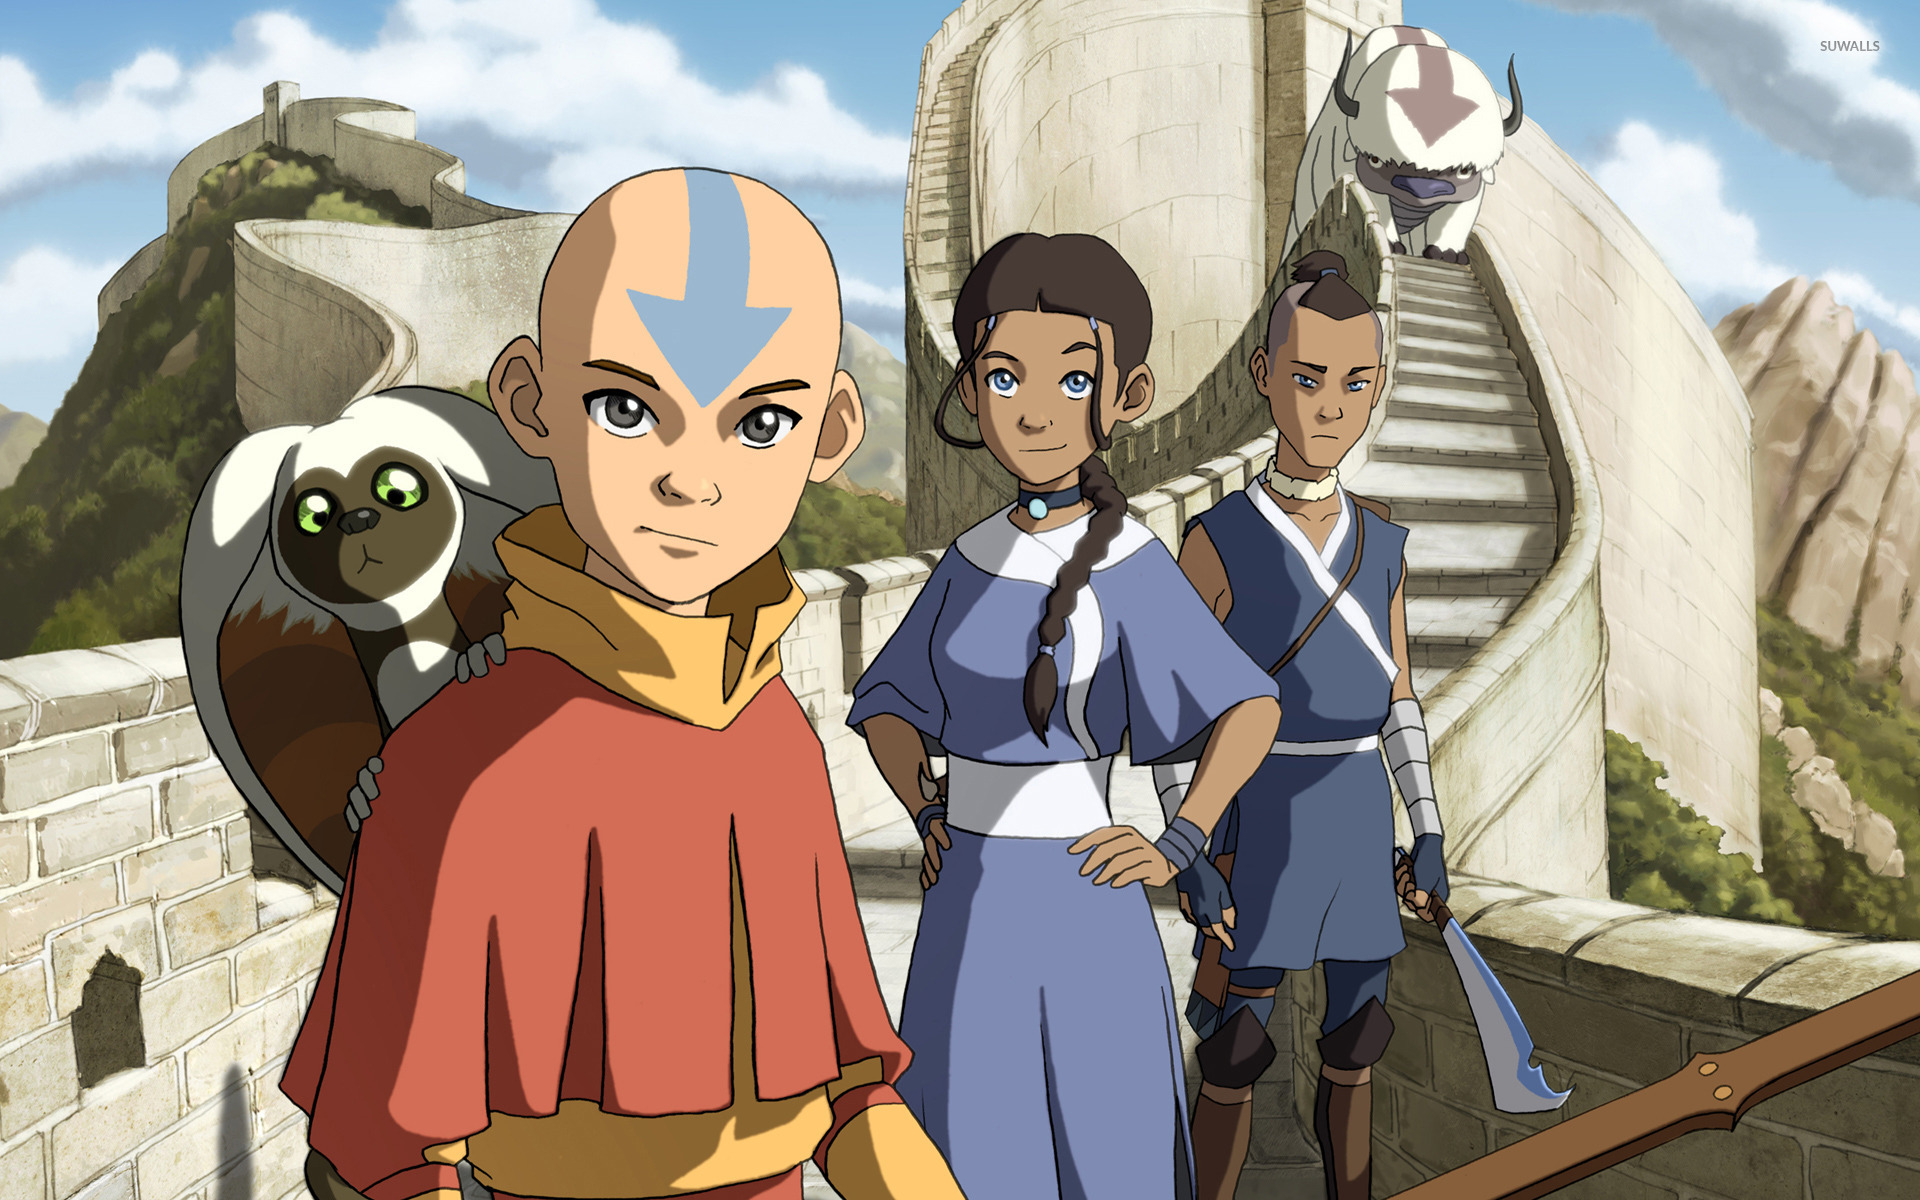 Avatar the last airbender 2